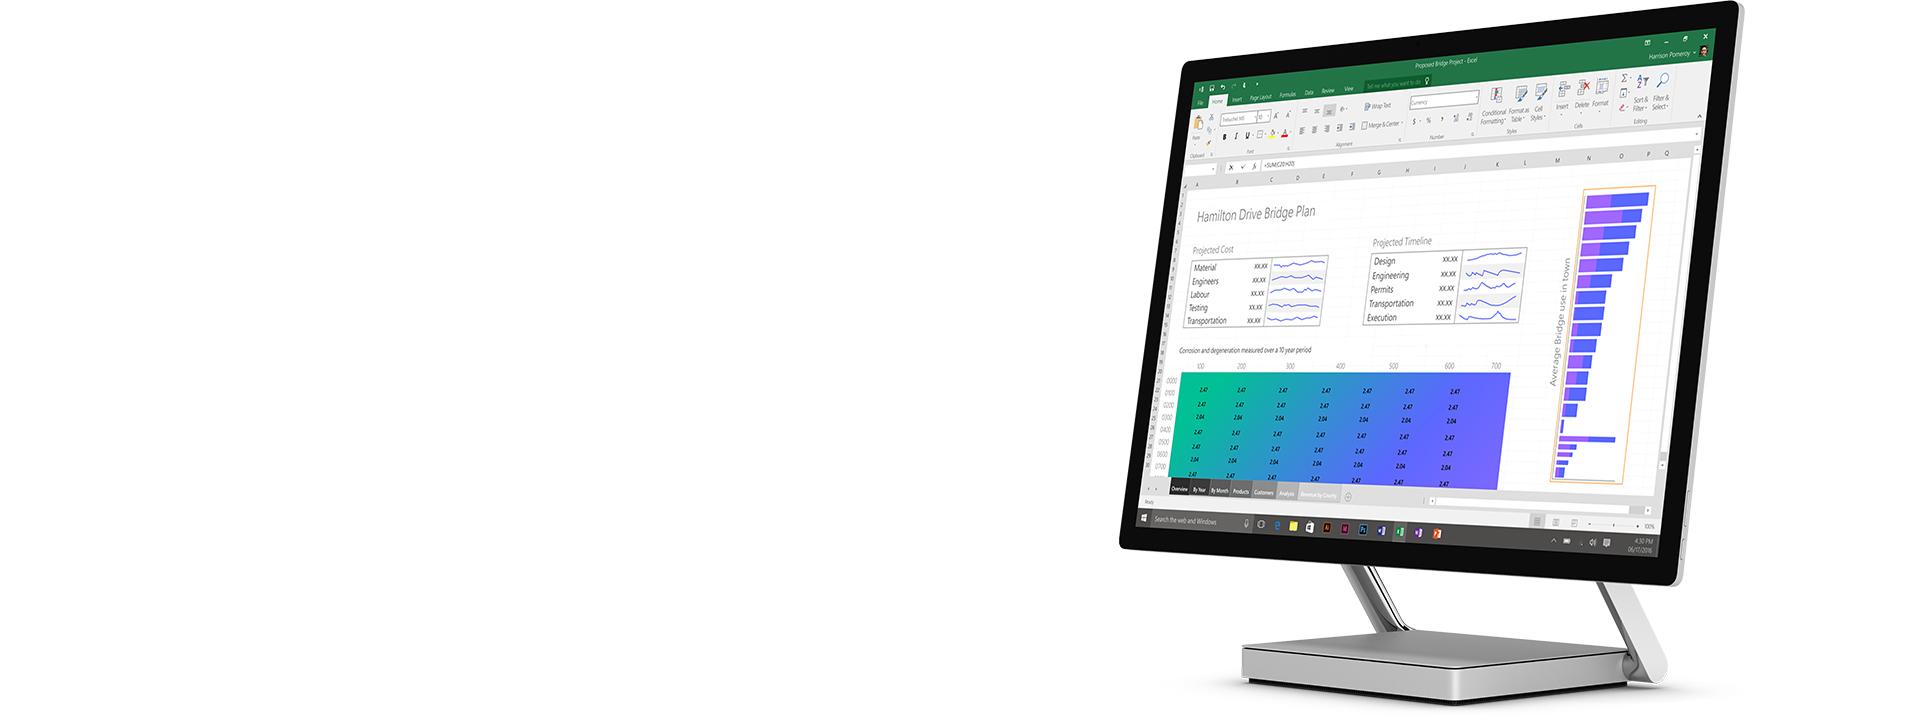 Surface Studio 採用桌上型電腦模式,並且螢幕上顯示已開啟的 Excel 試算表